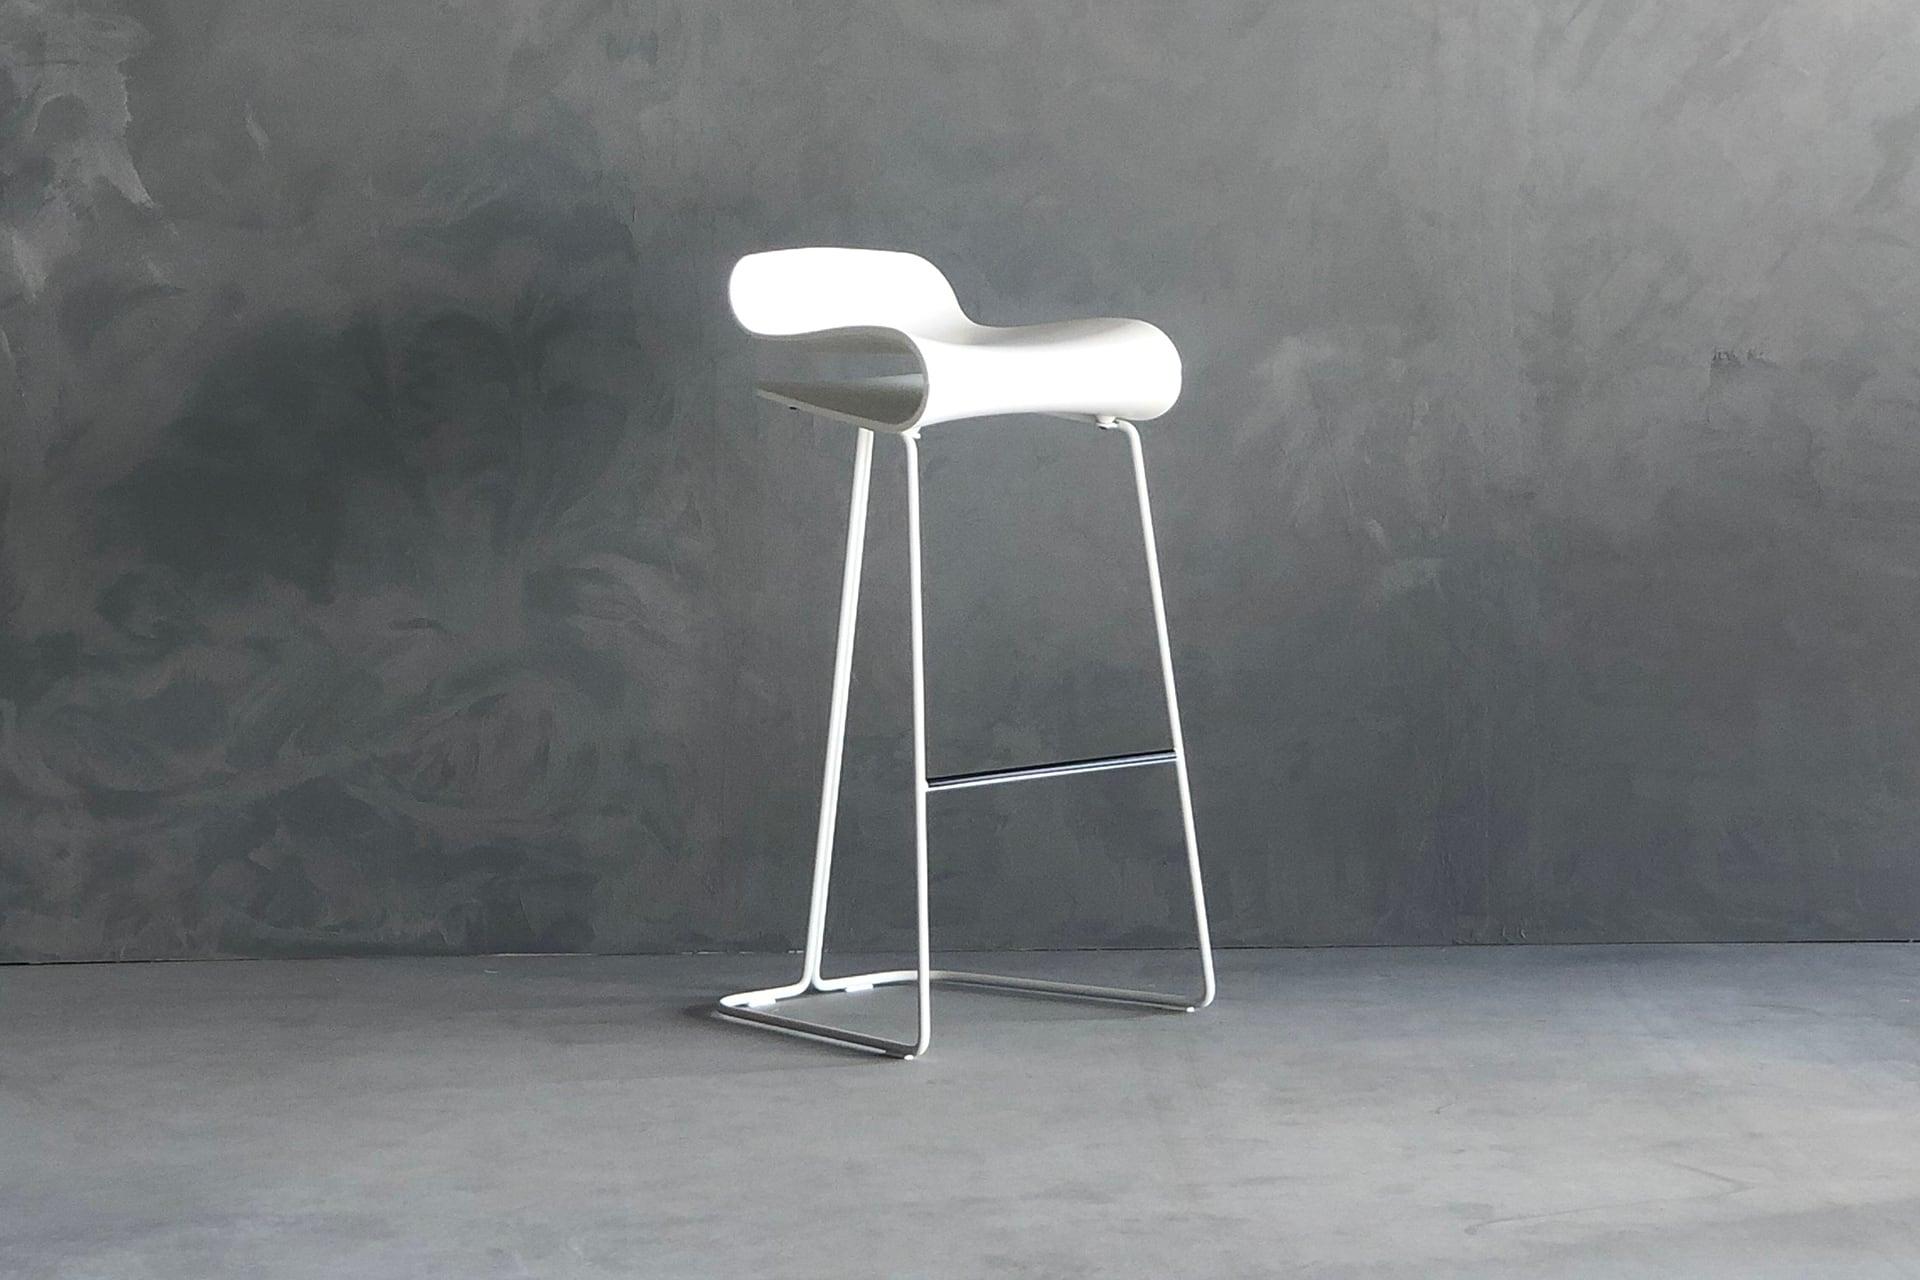 BCN/スチール脚/ホワイト【Outlet-展示品】(定価¥61,600-)